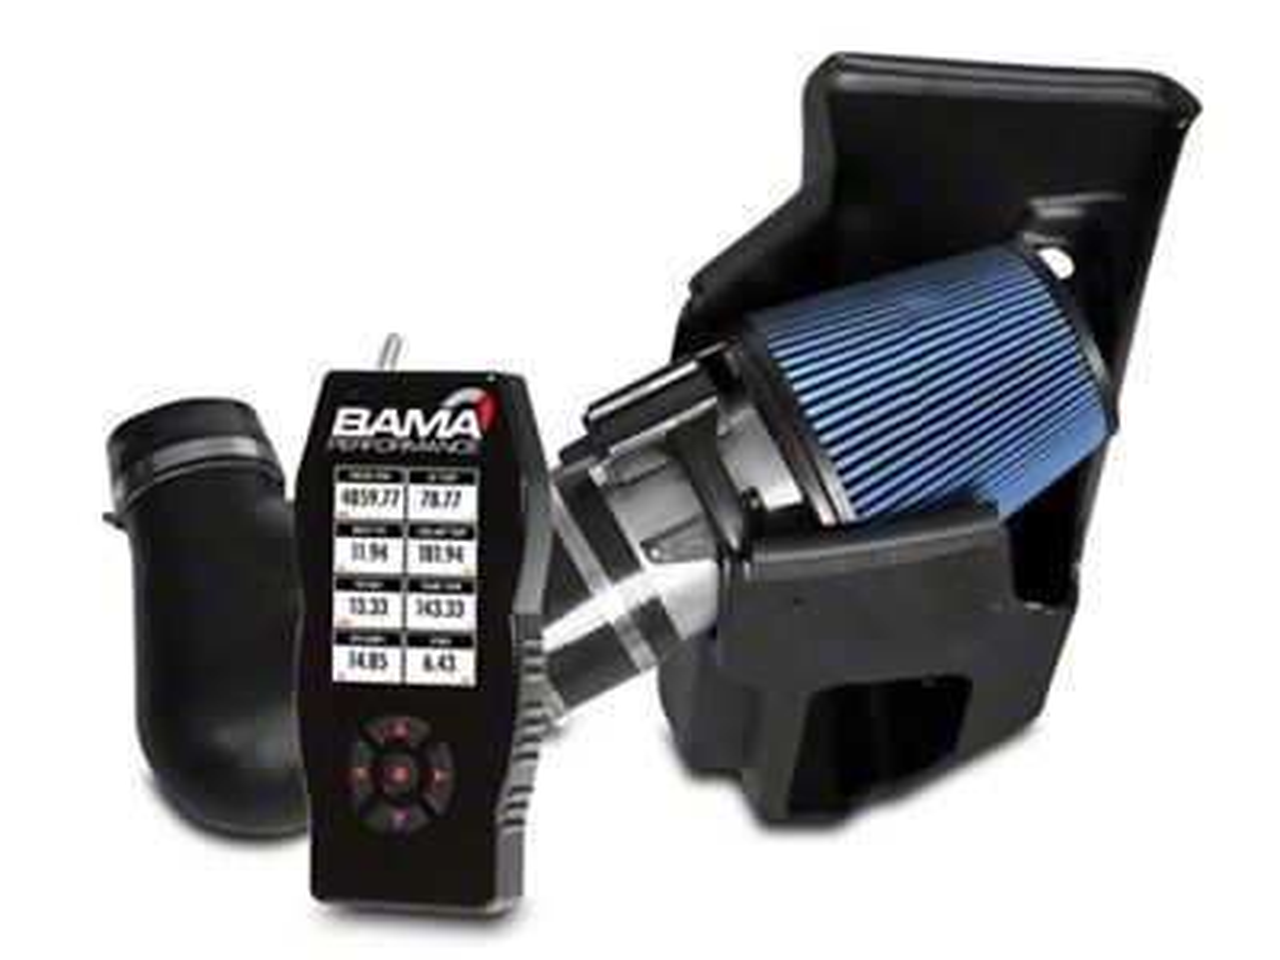 Bama PMAS Velocity Cold Air Intake & Bama X4 Tuner (15-17 GT)